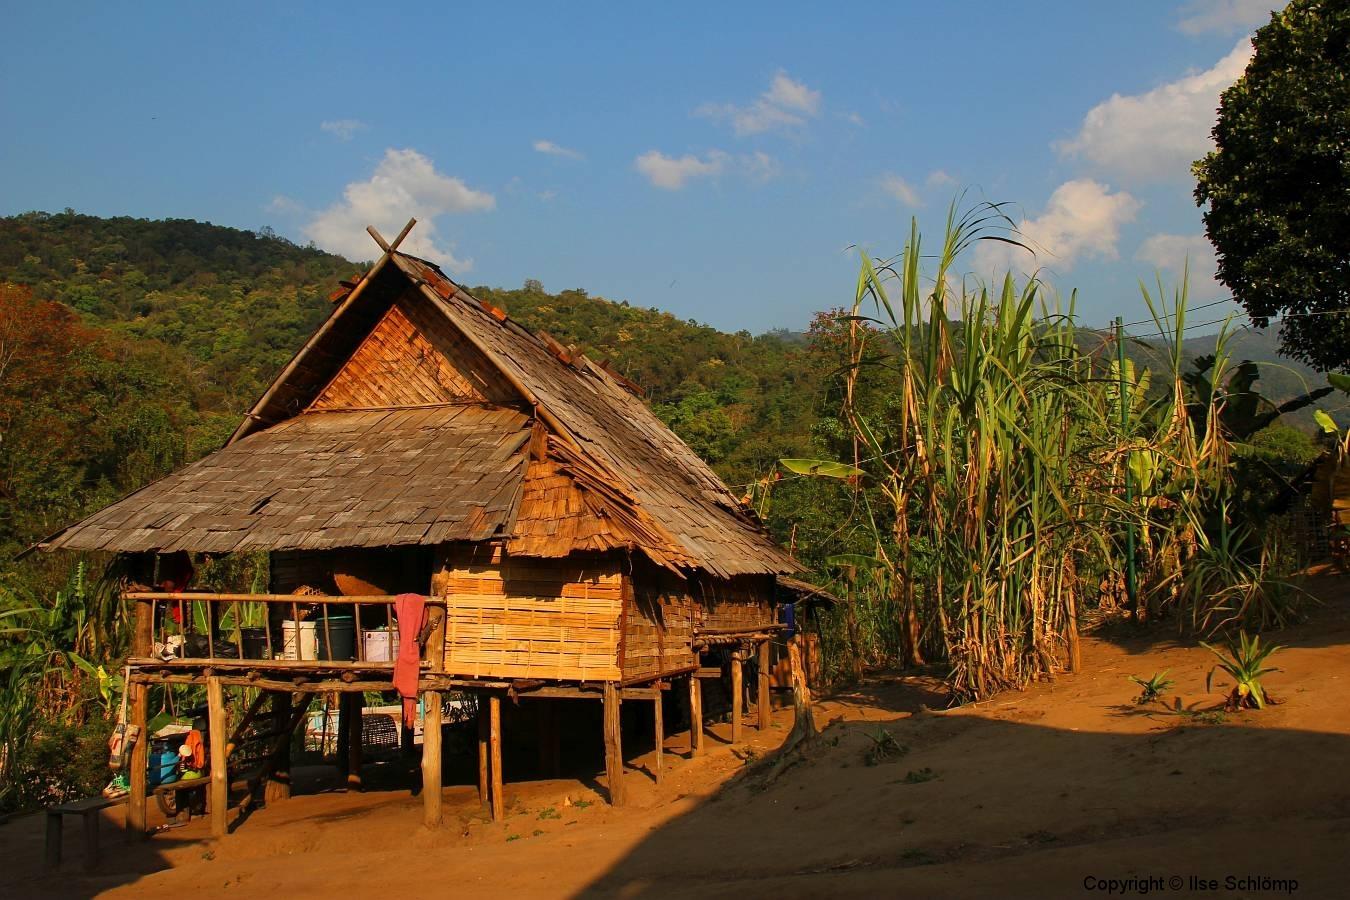 Laos, Oudomxay, Nam Kat Yola-Regenwald, Khmu Village